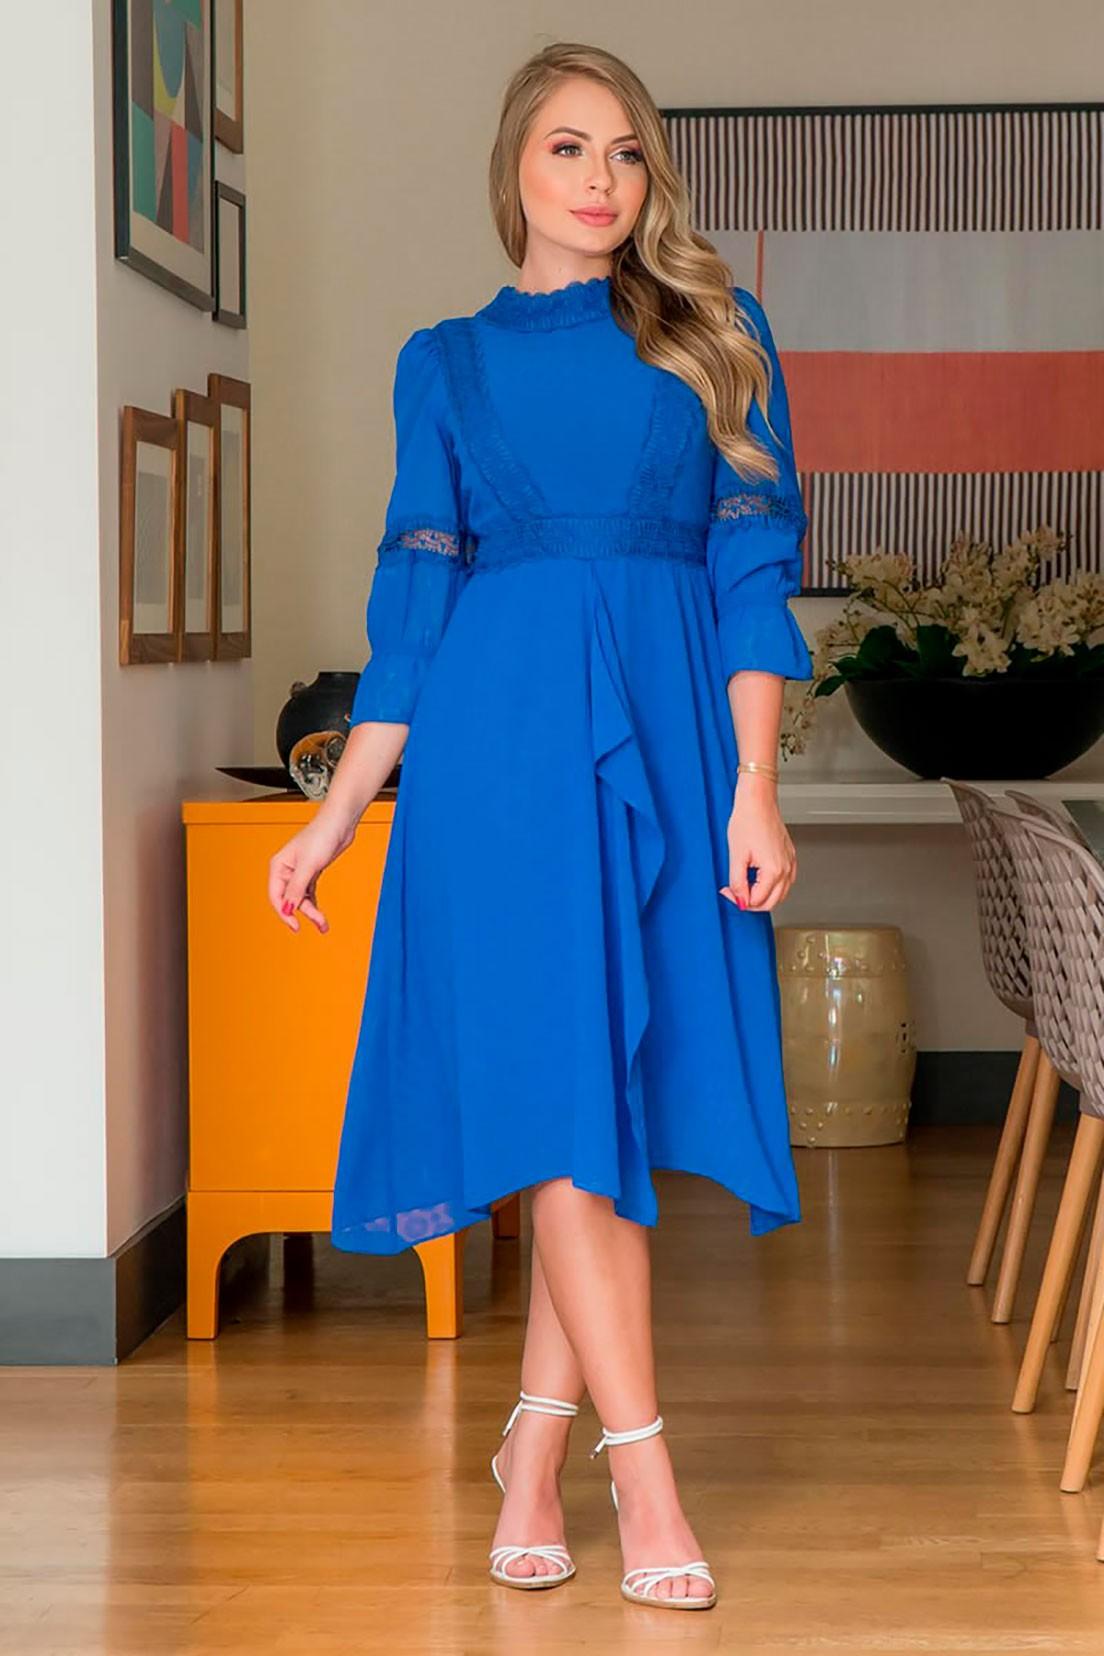 Vestido Chiffon Detalhes Renda Kauly 2939 Azul